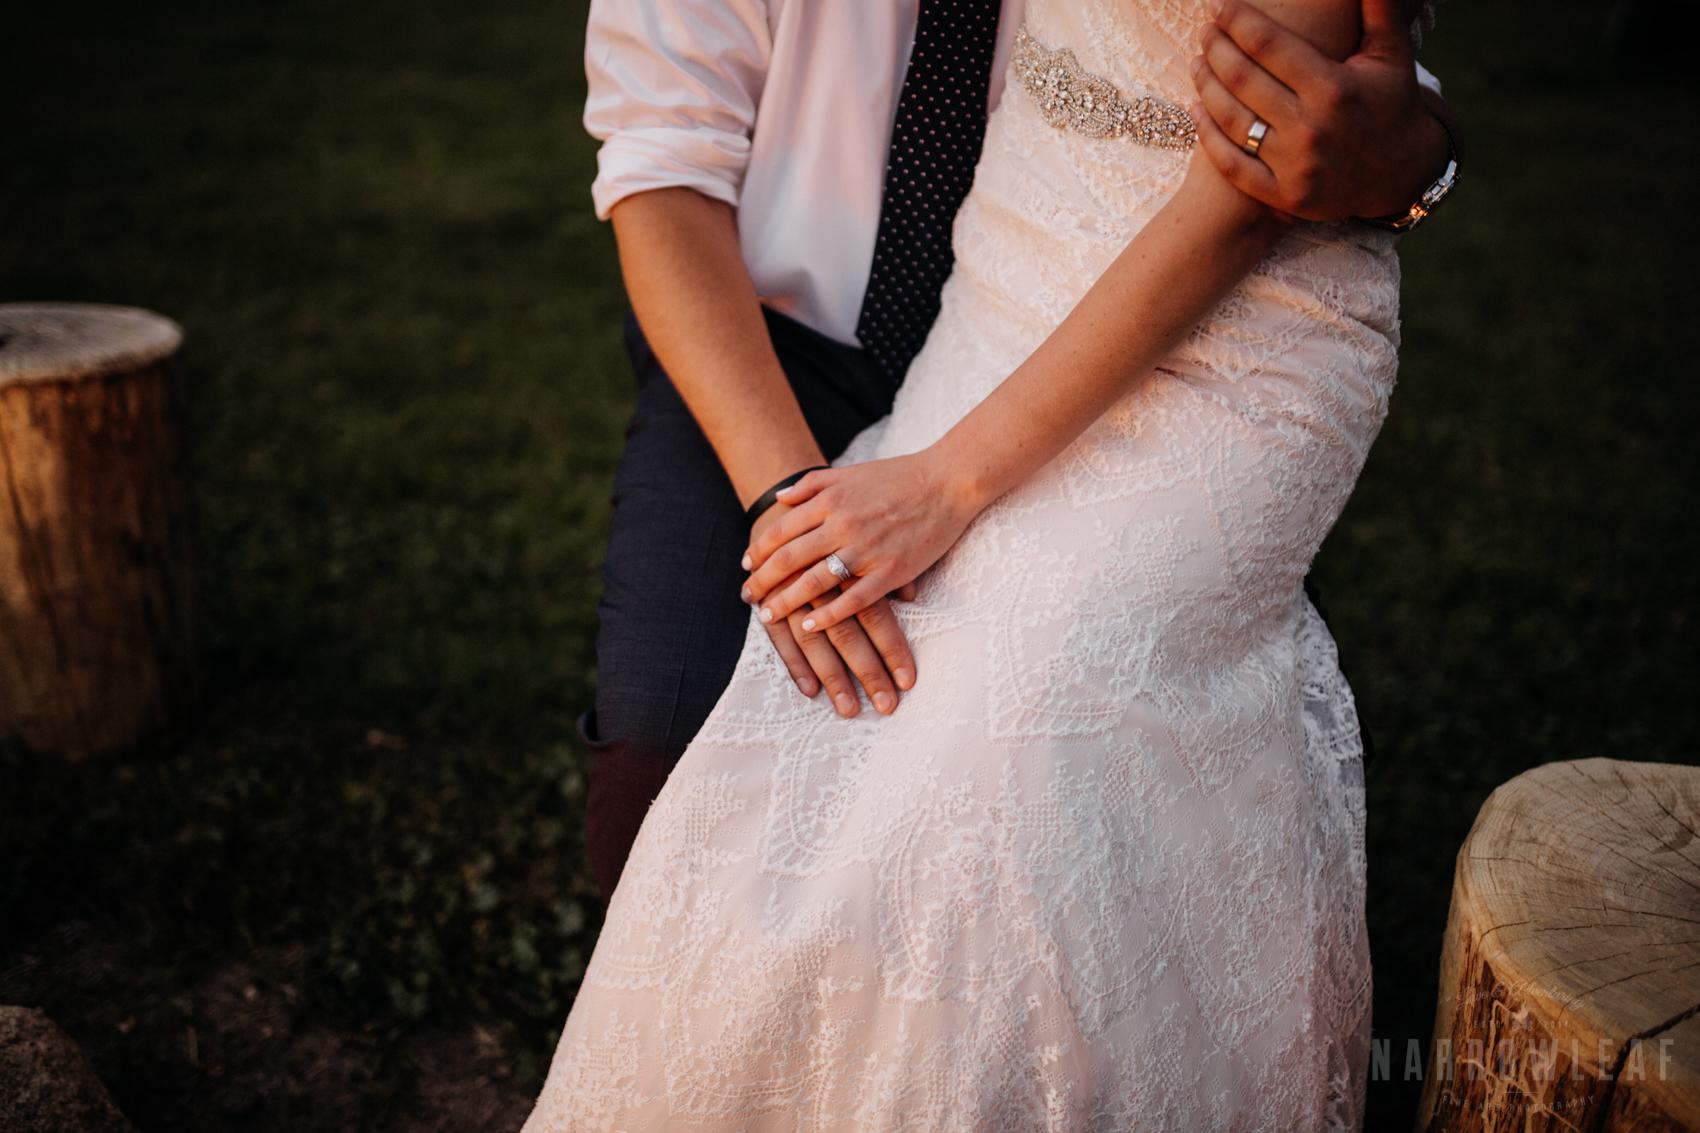 bride-groom-cuddling-by-the-bonfire-under-cafe-lights-night-34.jpg